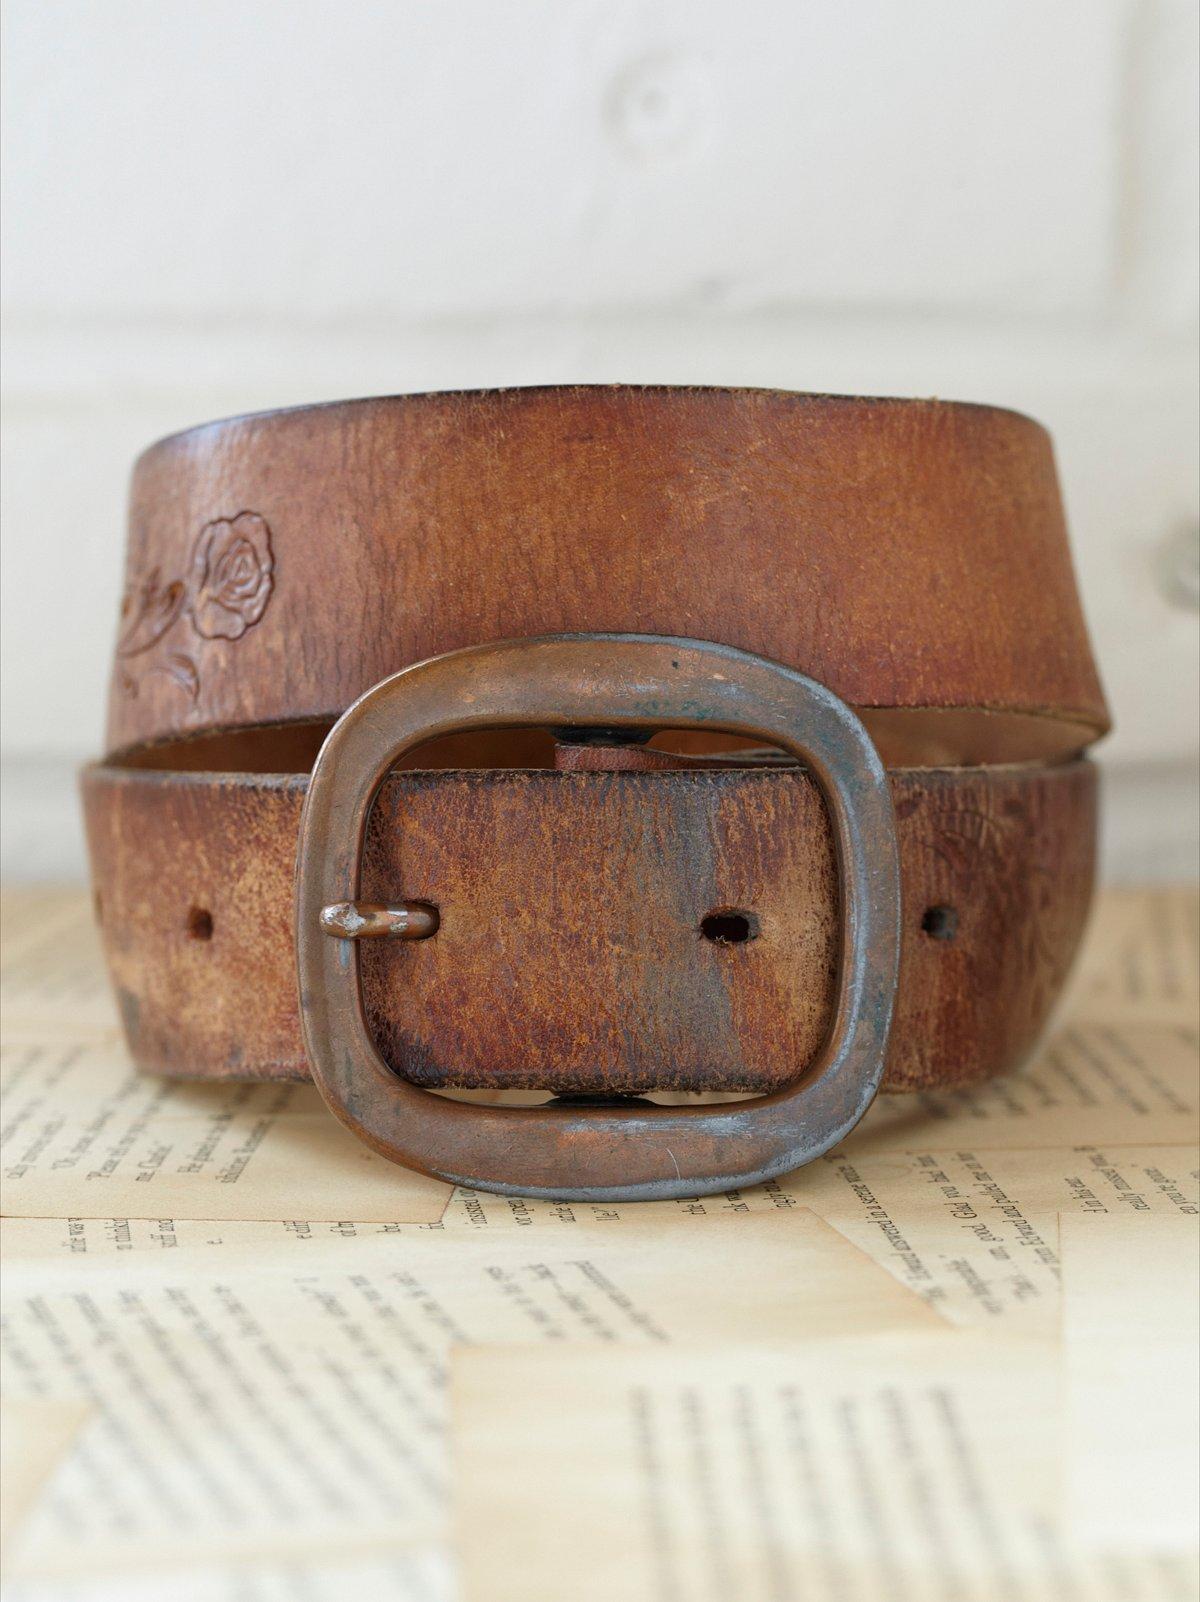 Vintage 1970s Maggie May Belt